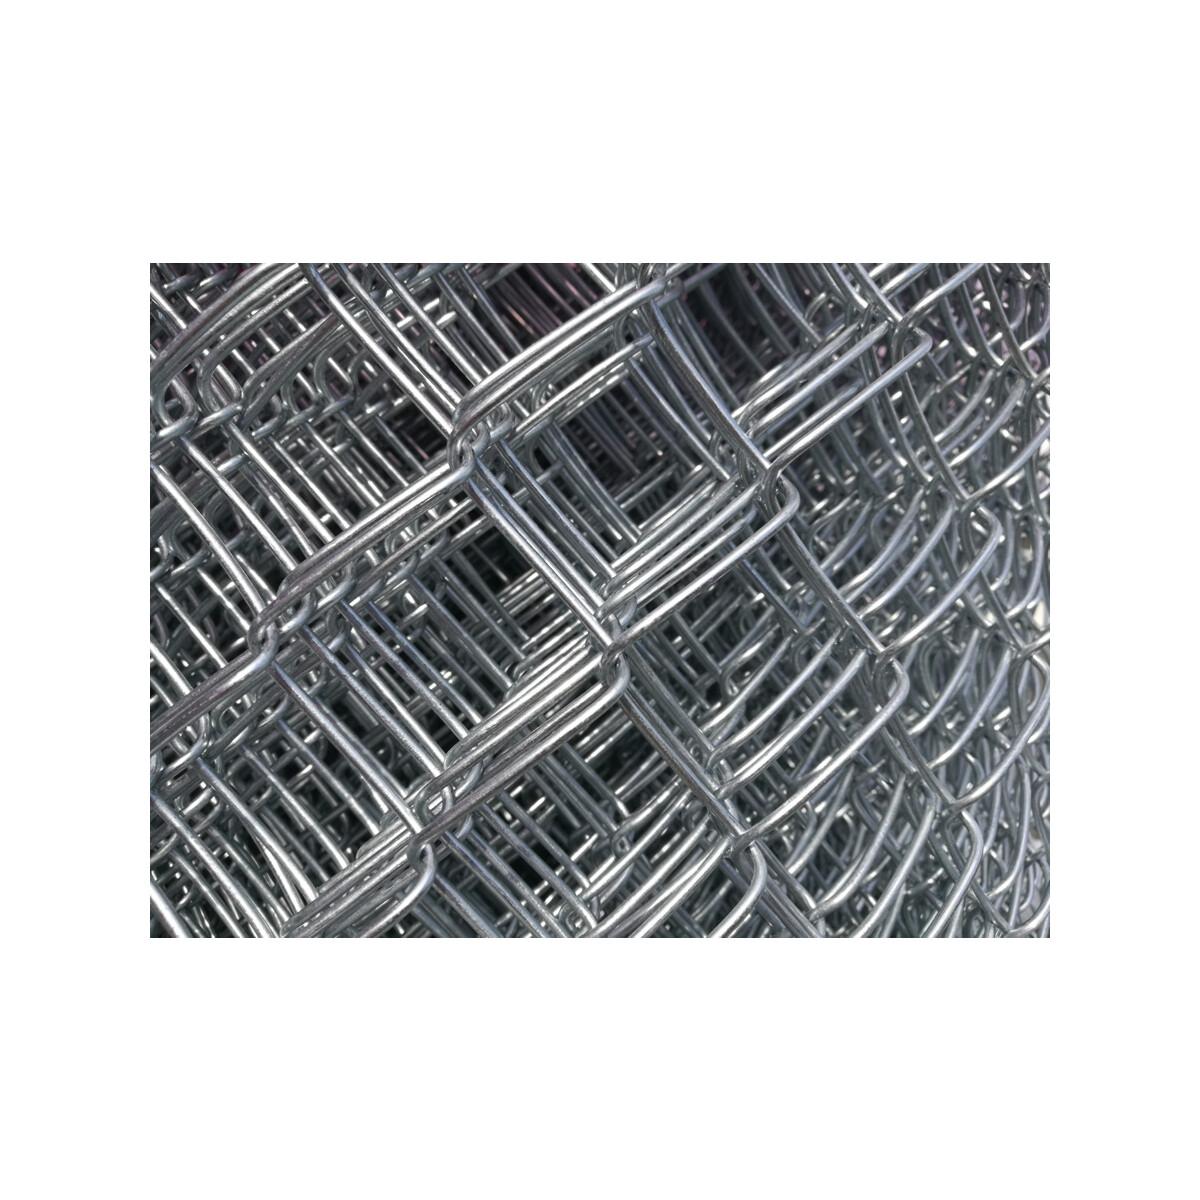 Diagonalgeflecht MW 50 x 50 mm, Draht 2.2 mm - ### REAL ZÄUNE AG ###